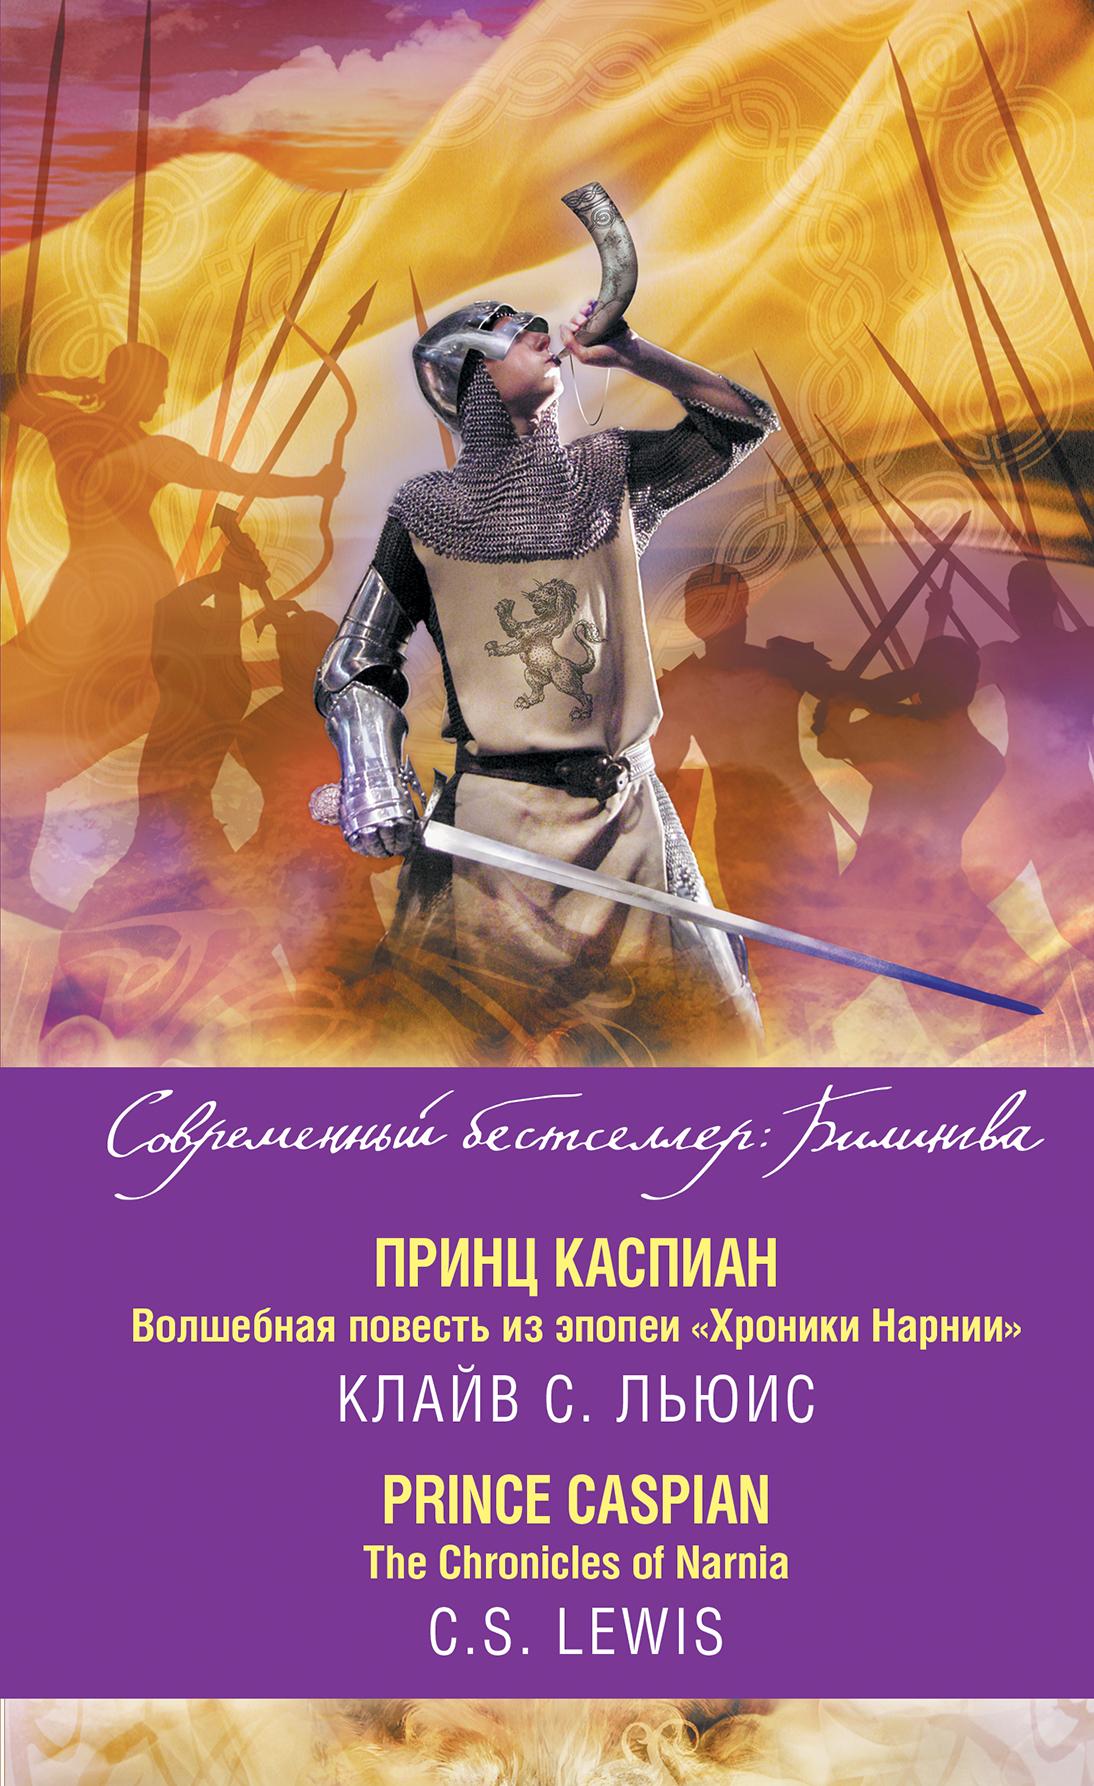 prints kaspian volshebnaya povest iz epopei khroniki narnii the chronicles of narnia prince caspian